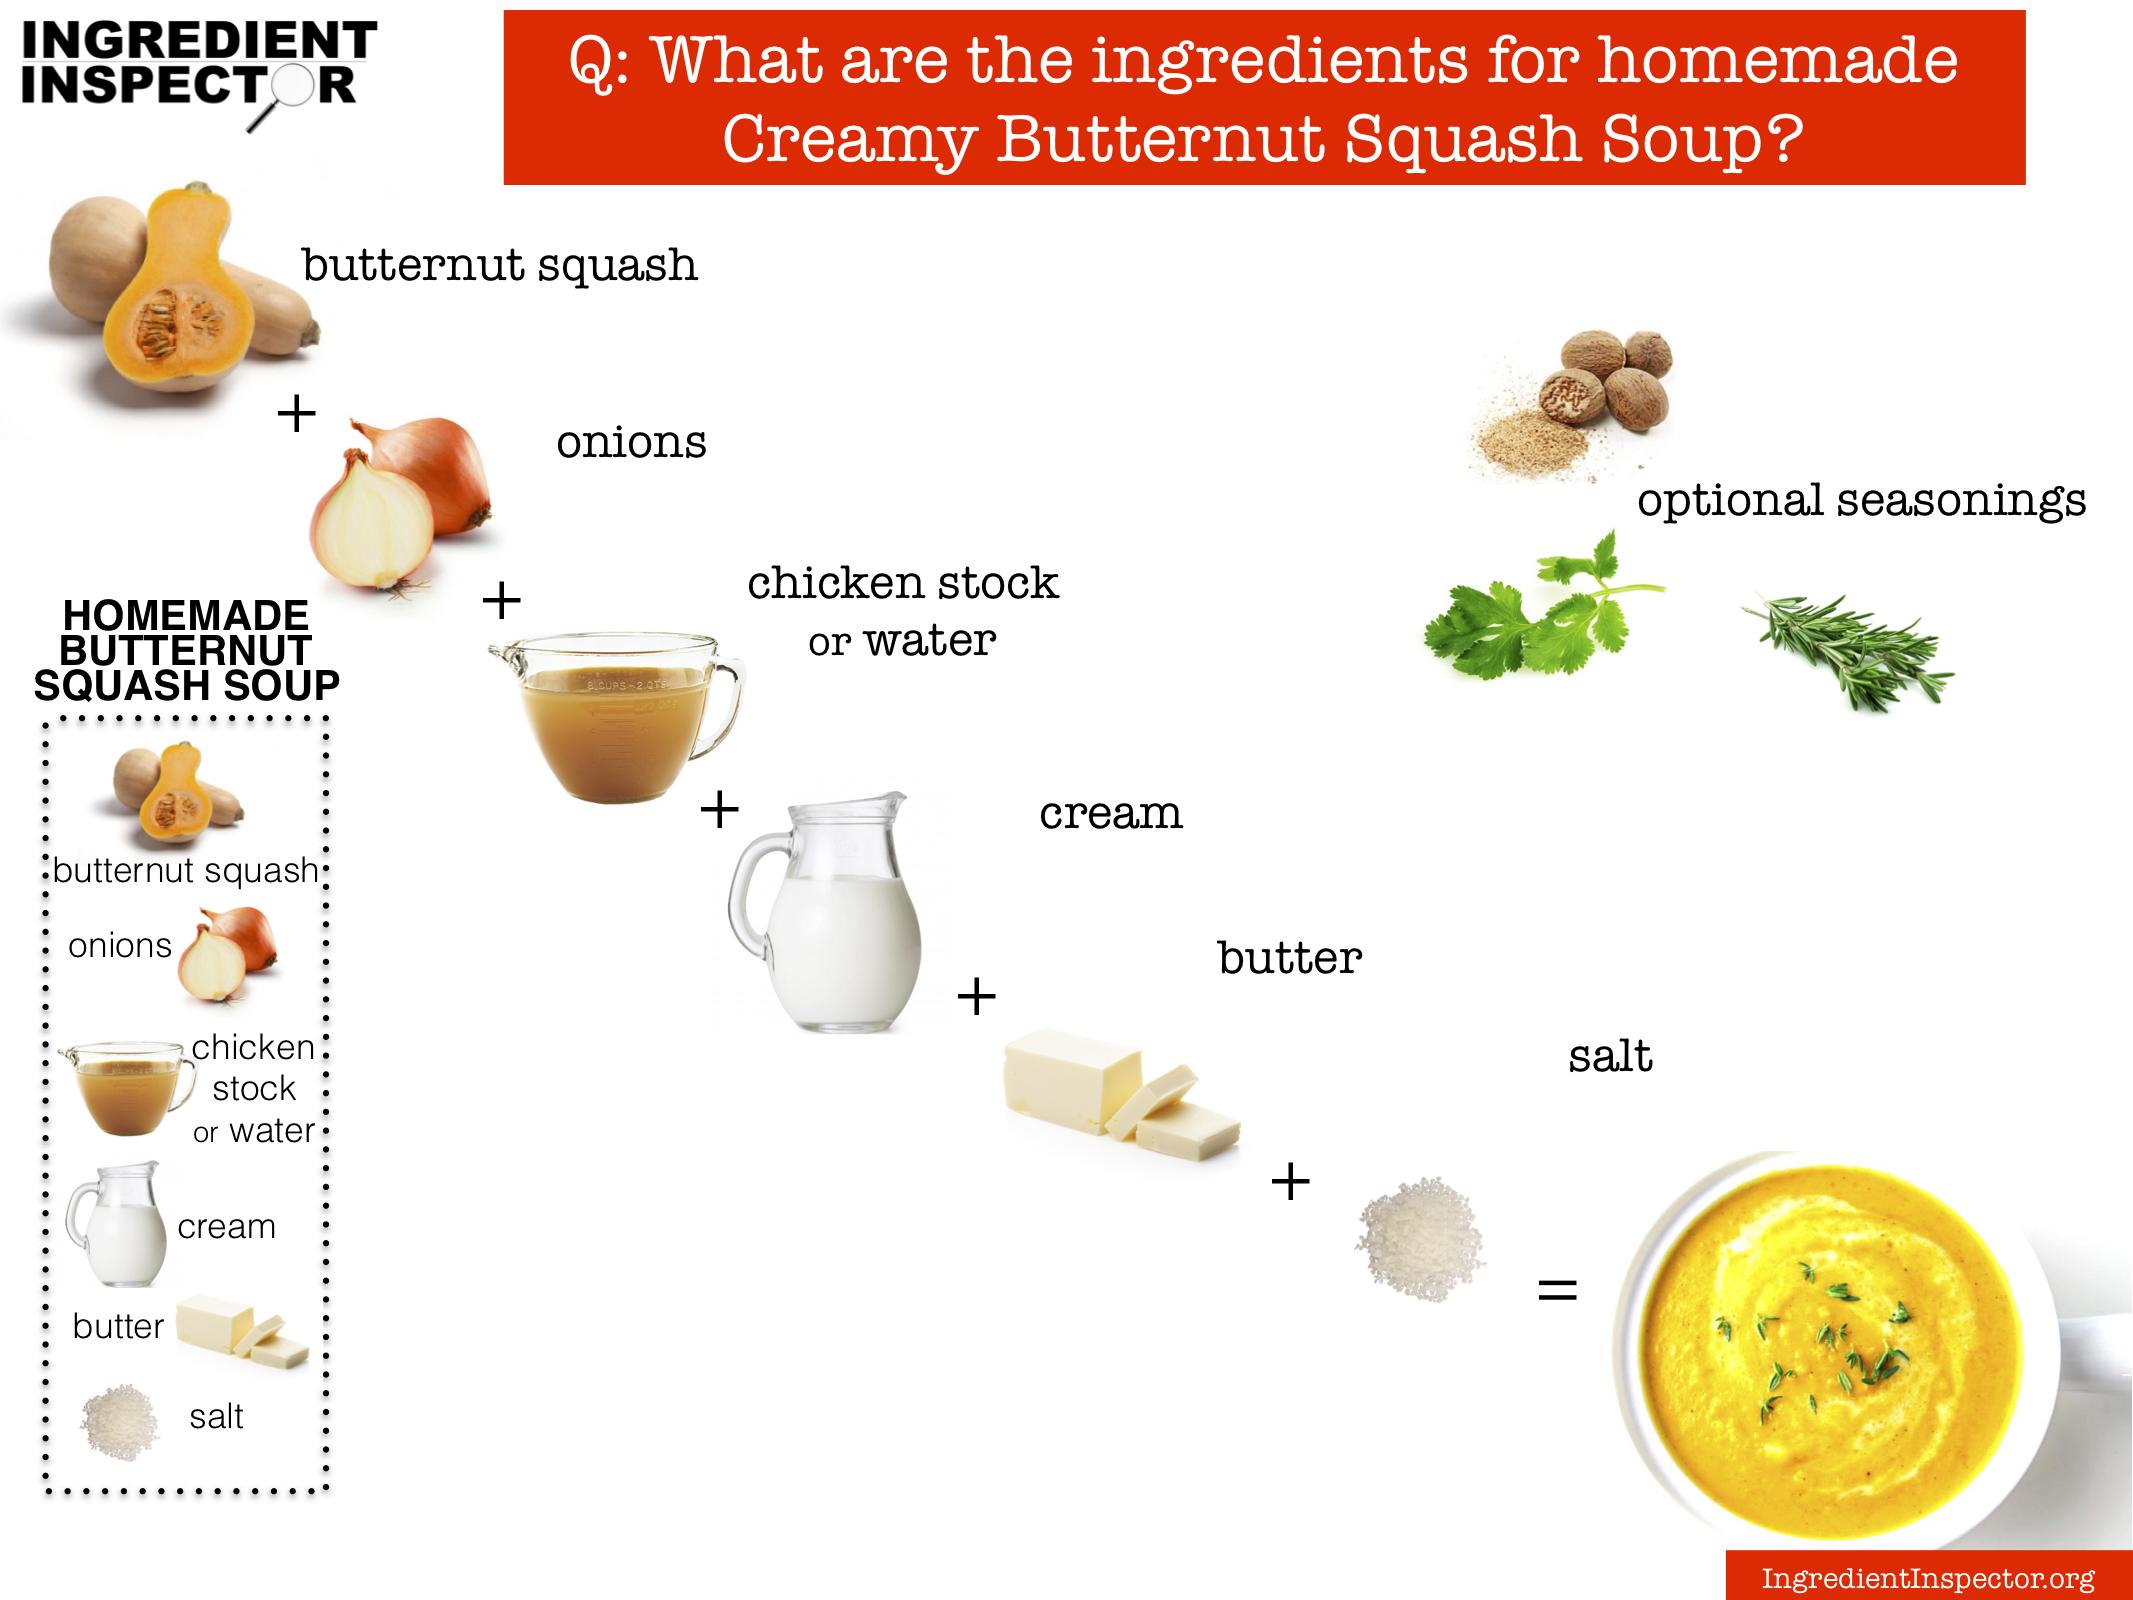 Ingredient Inspector Butternut Squash Soup Ingredients.jpg